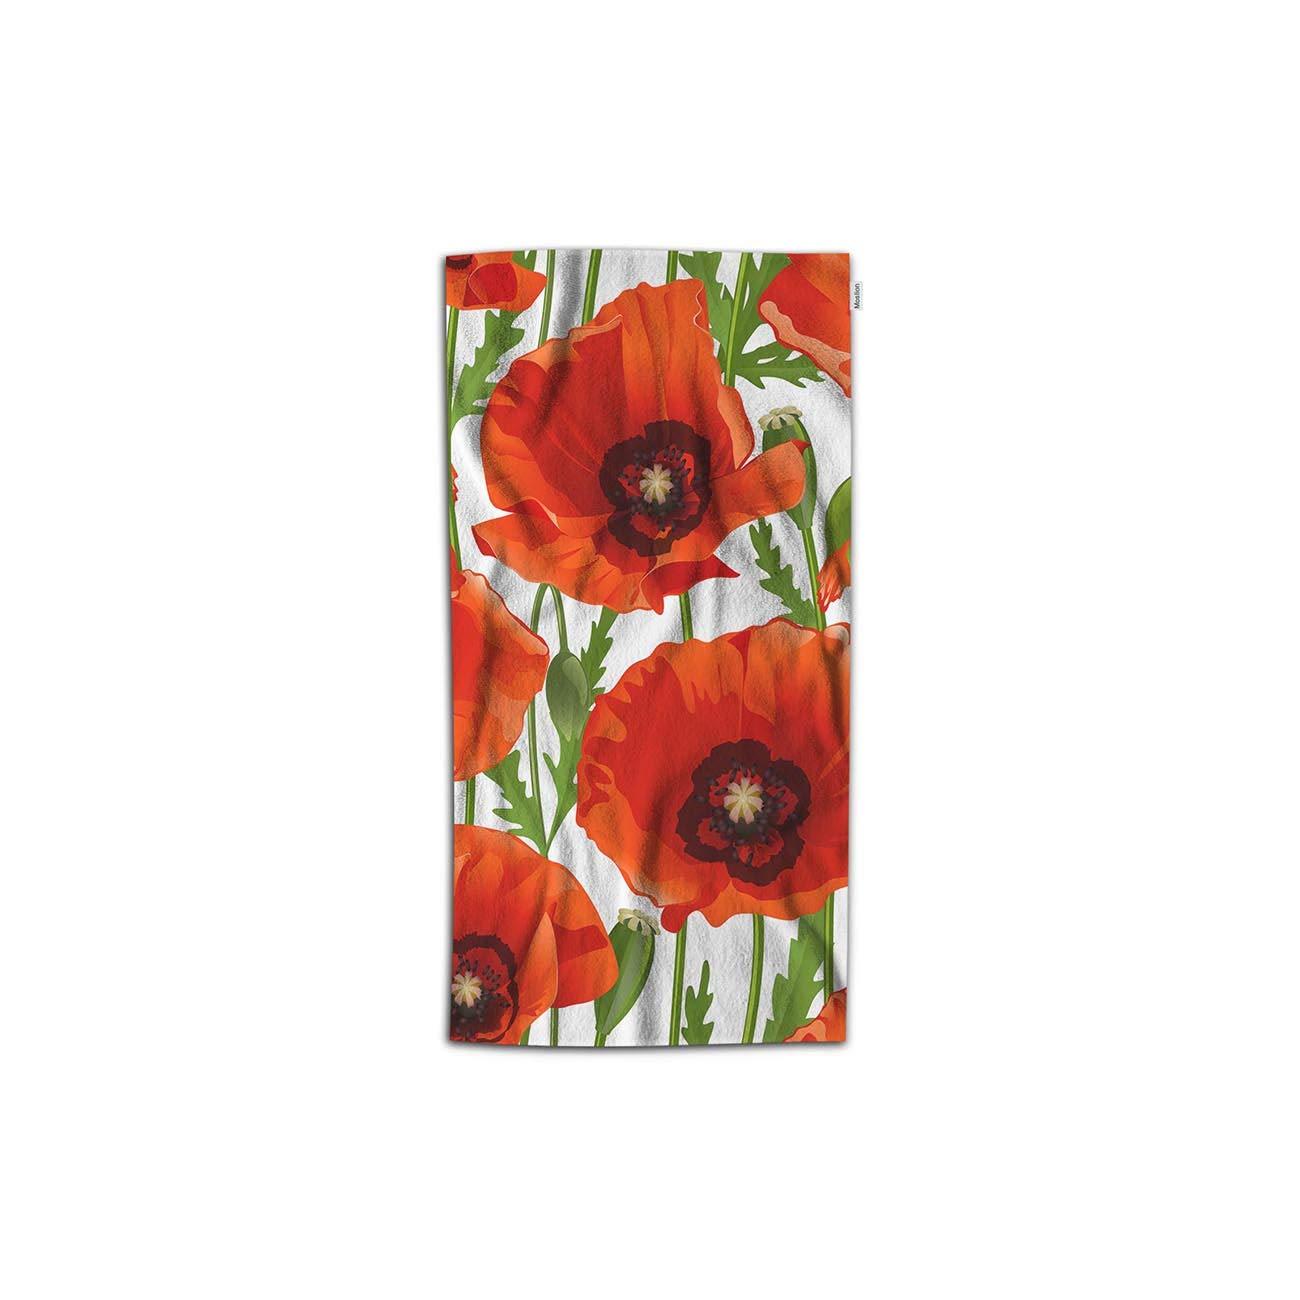 Moslion Floral Hand Towel Nature Botanical Plant Poppy Flower Bud Leaf Towel Soft Microfiber Face Hand Towel Kitchen Bathroom for Kids Baby Men 15x30 Inch Red Green White